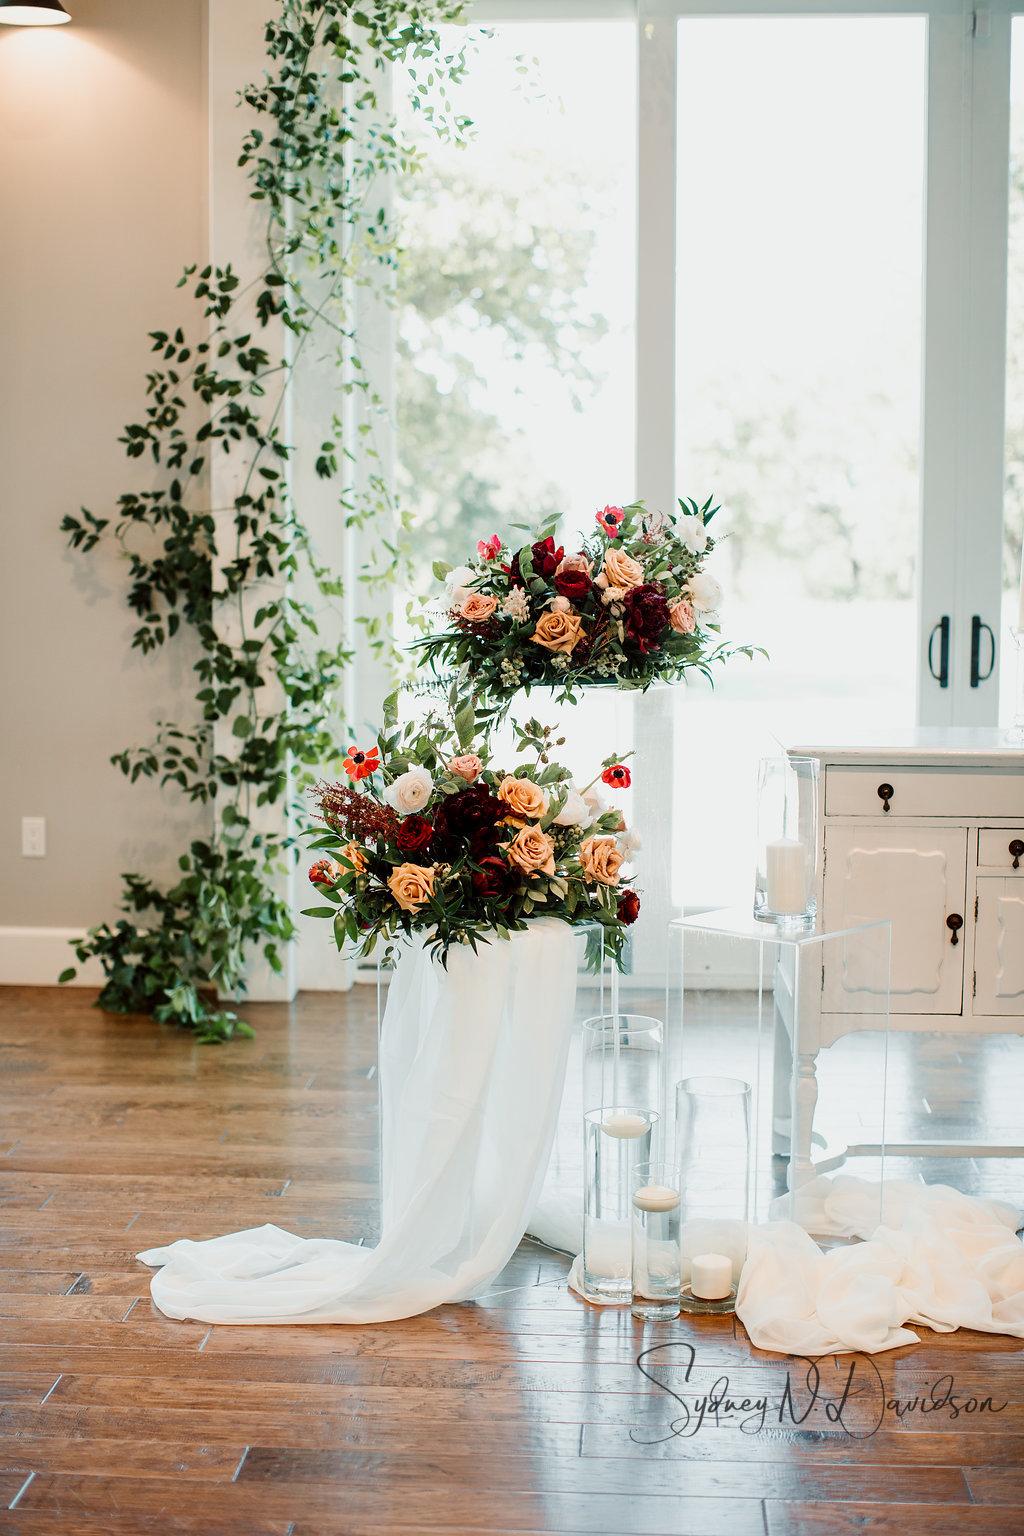 sydney-davidson-wedding-stillwater-oklahoma-wedding-session-traveling-photographer-portrait-tulsa-oklahoma-2565.jpg